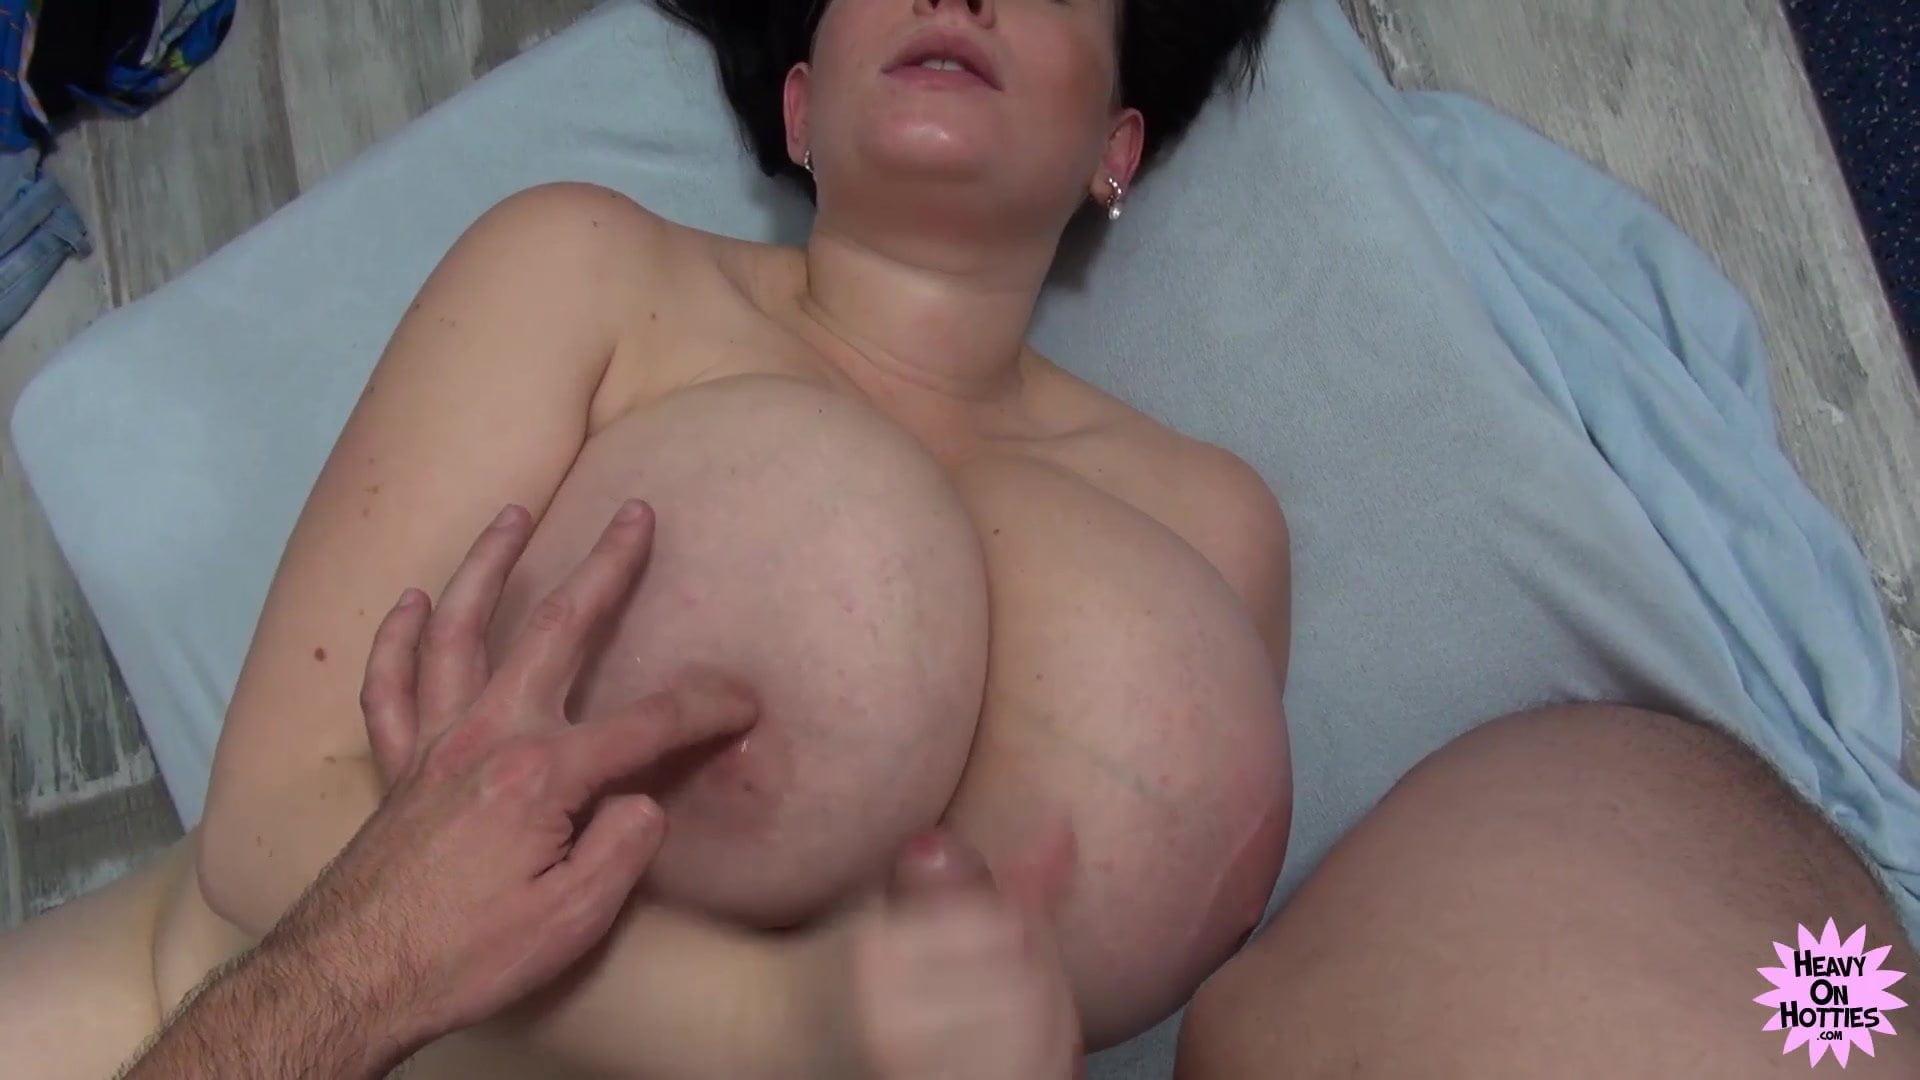 Beverly deangelo nude